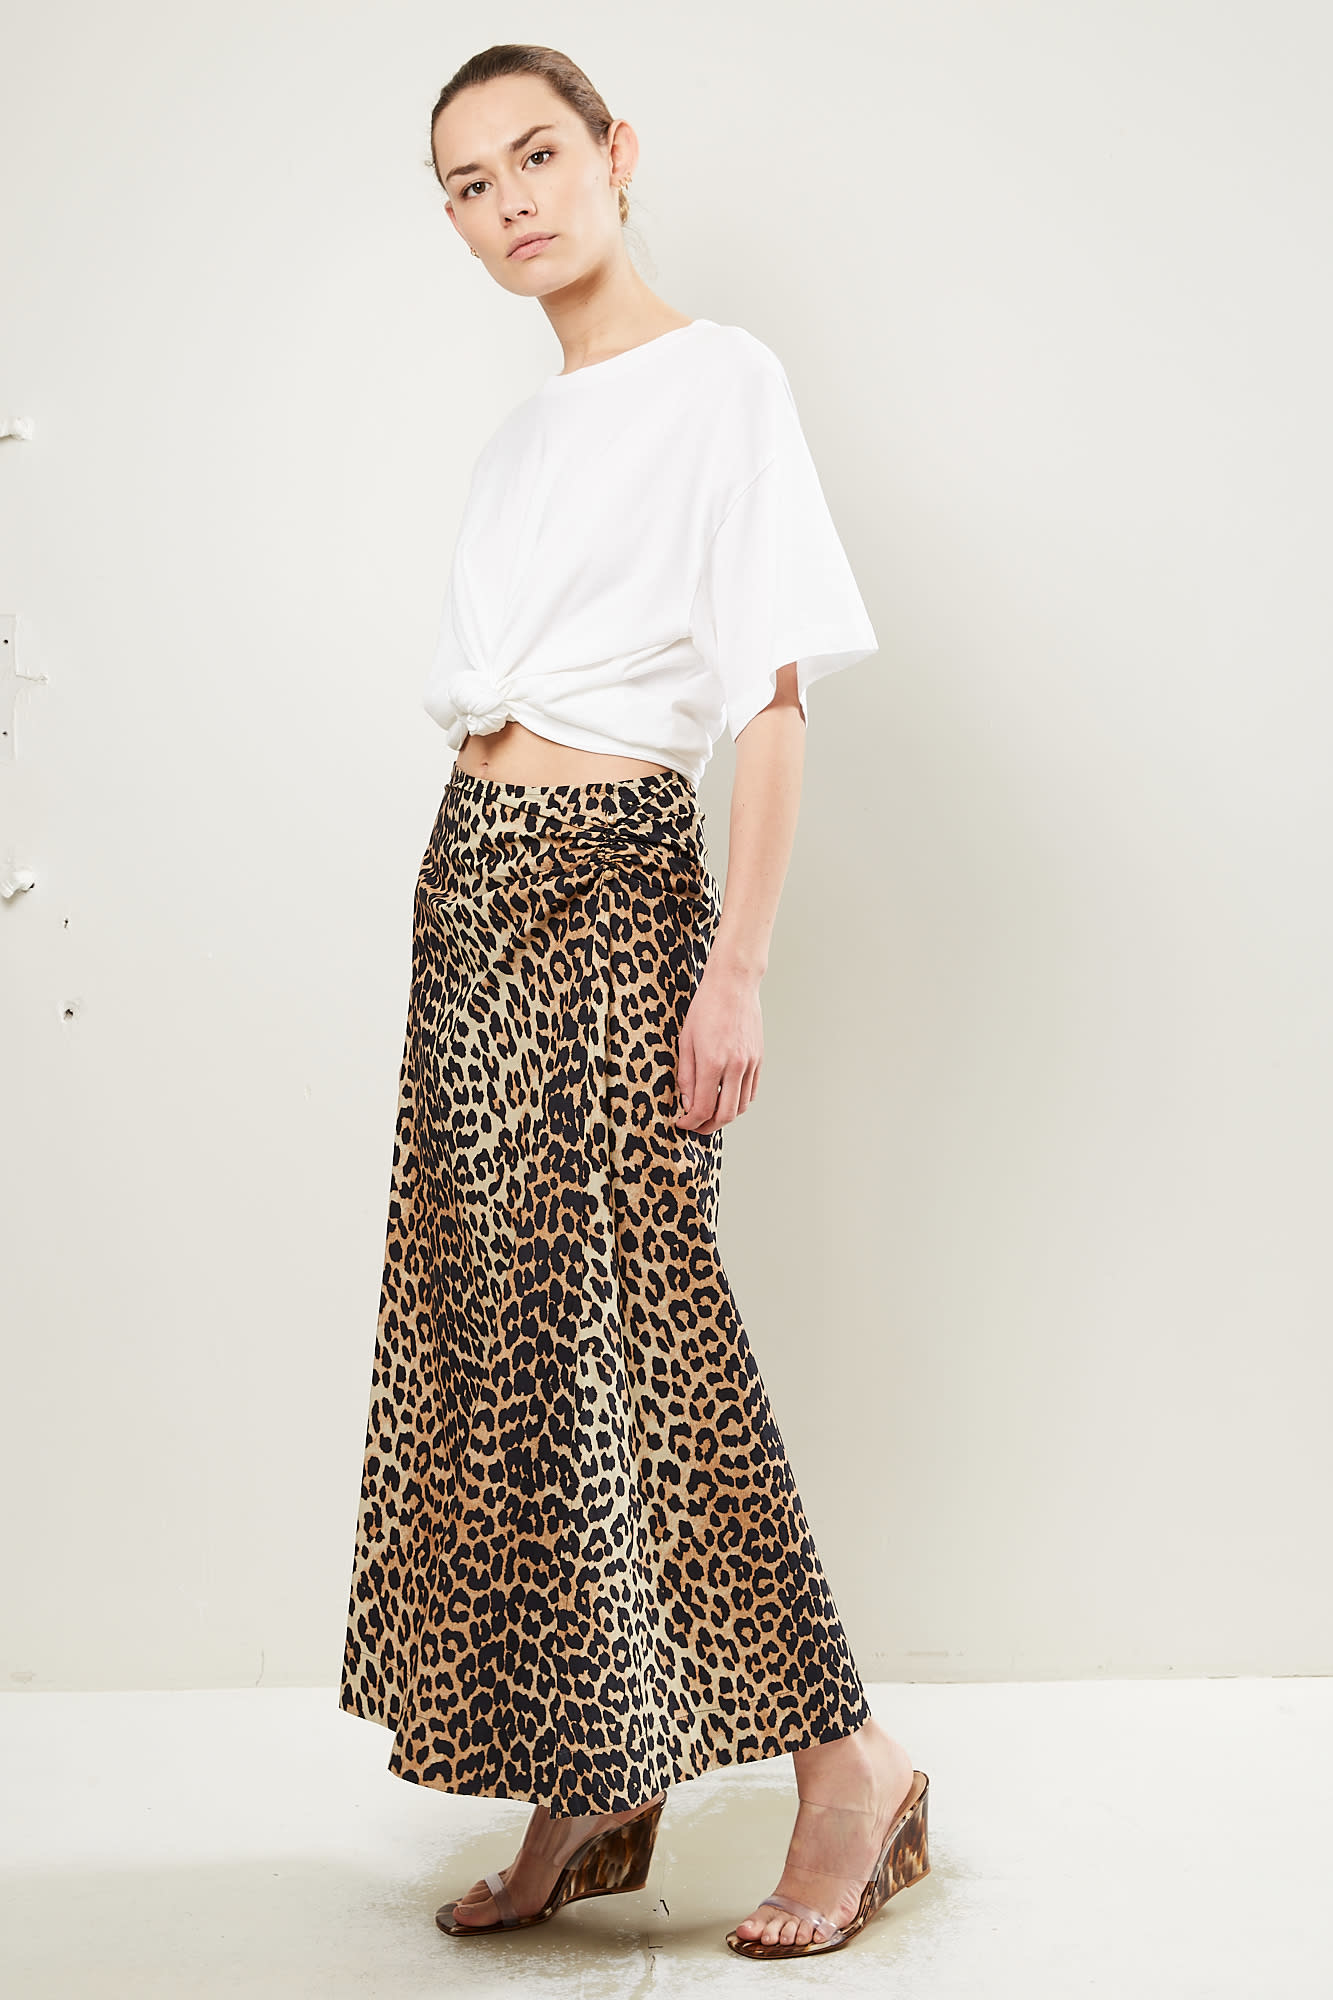 Ganni - Printed cotton poplin leopard skirt